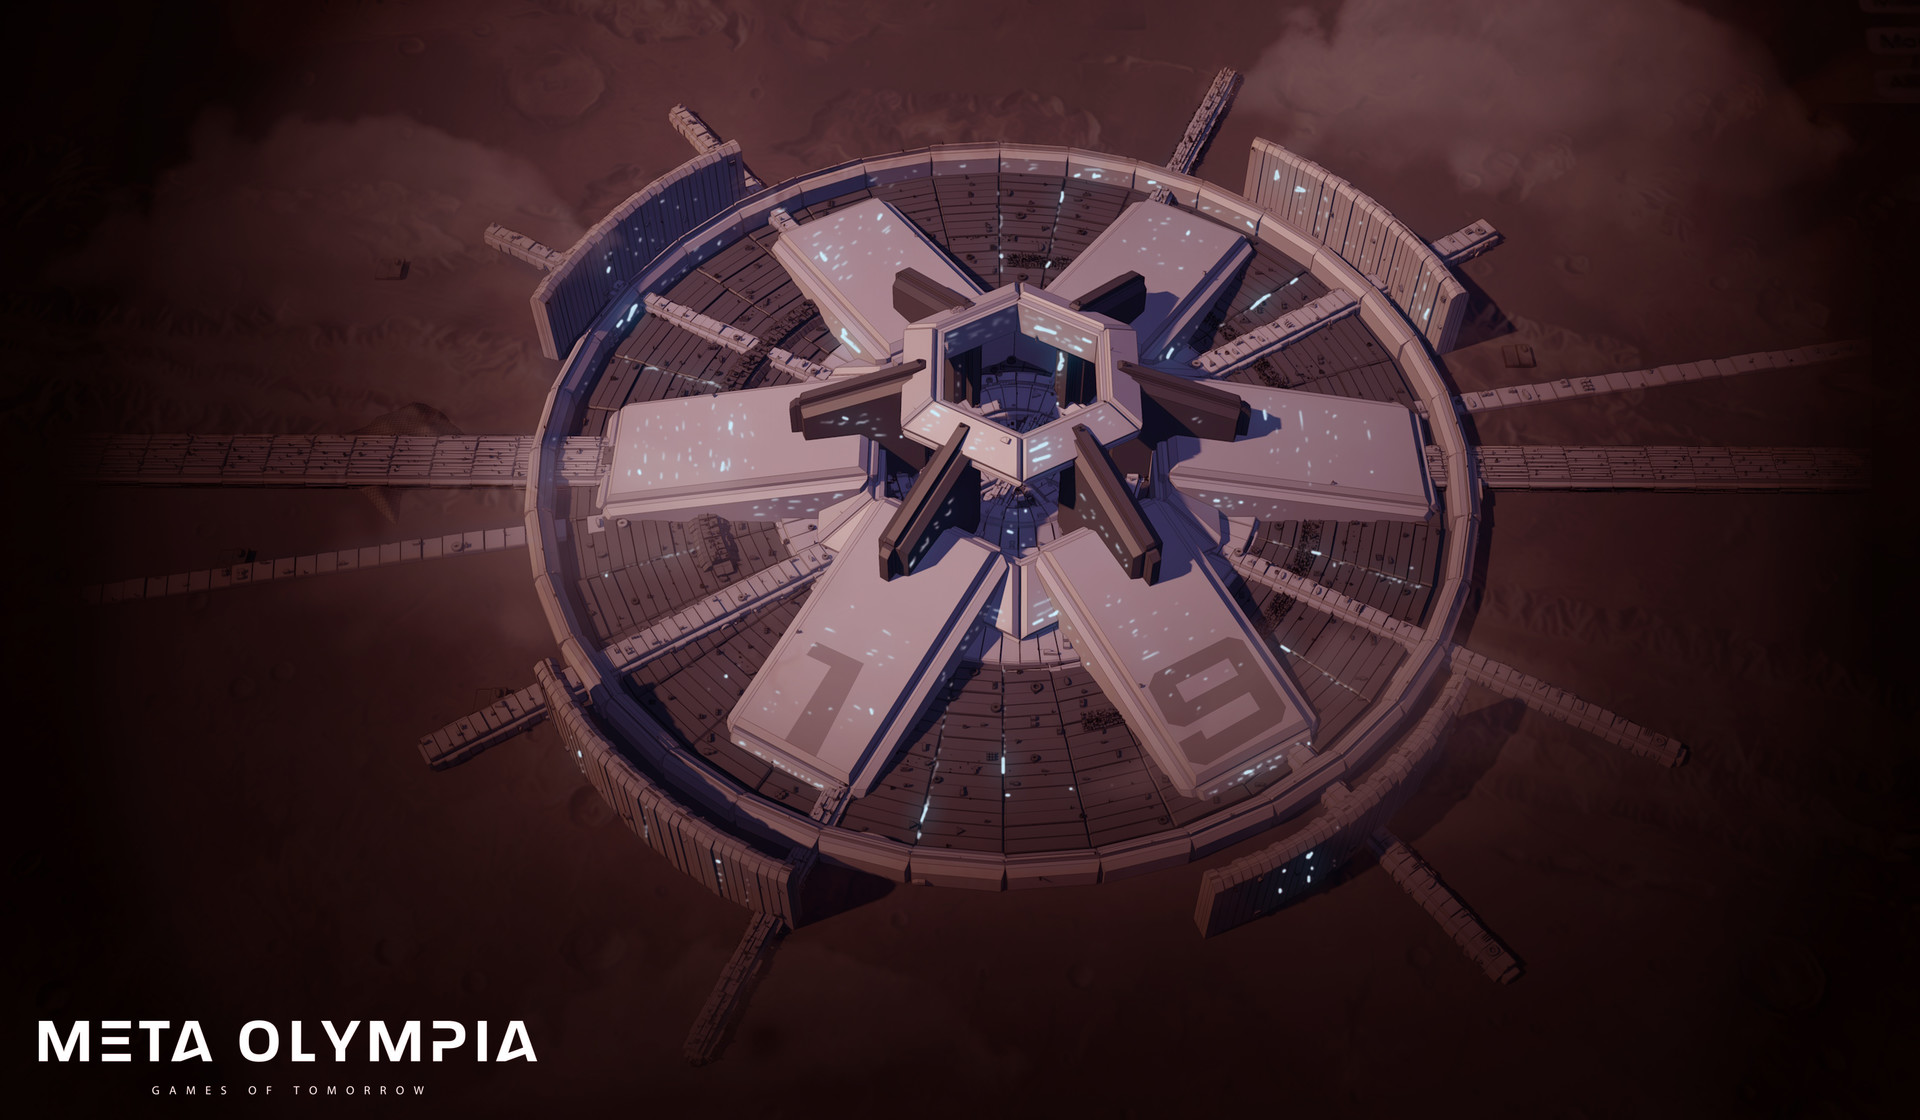 Meta olympia environment 1